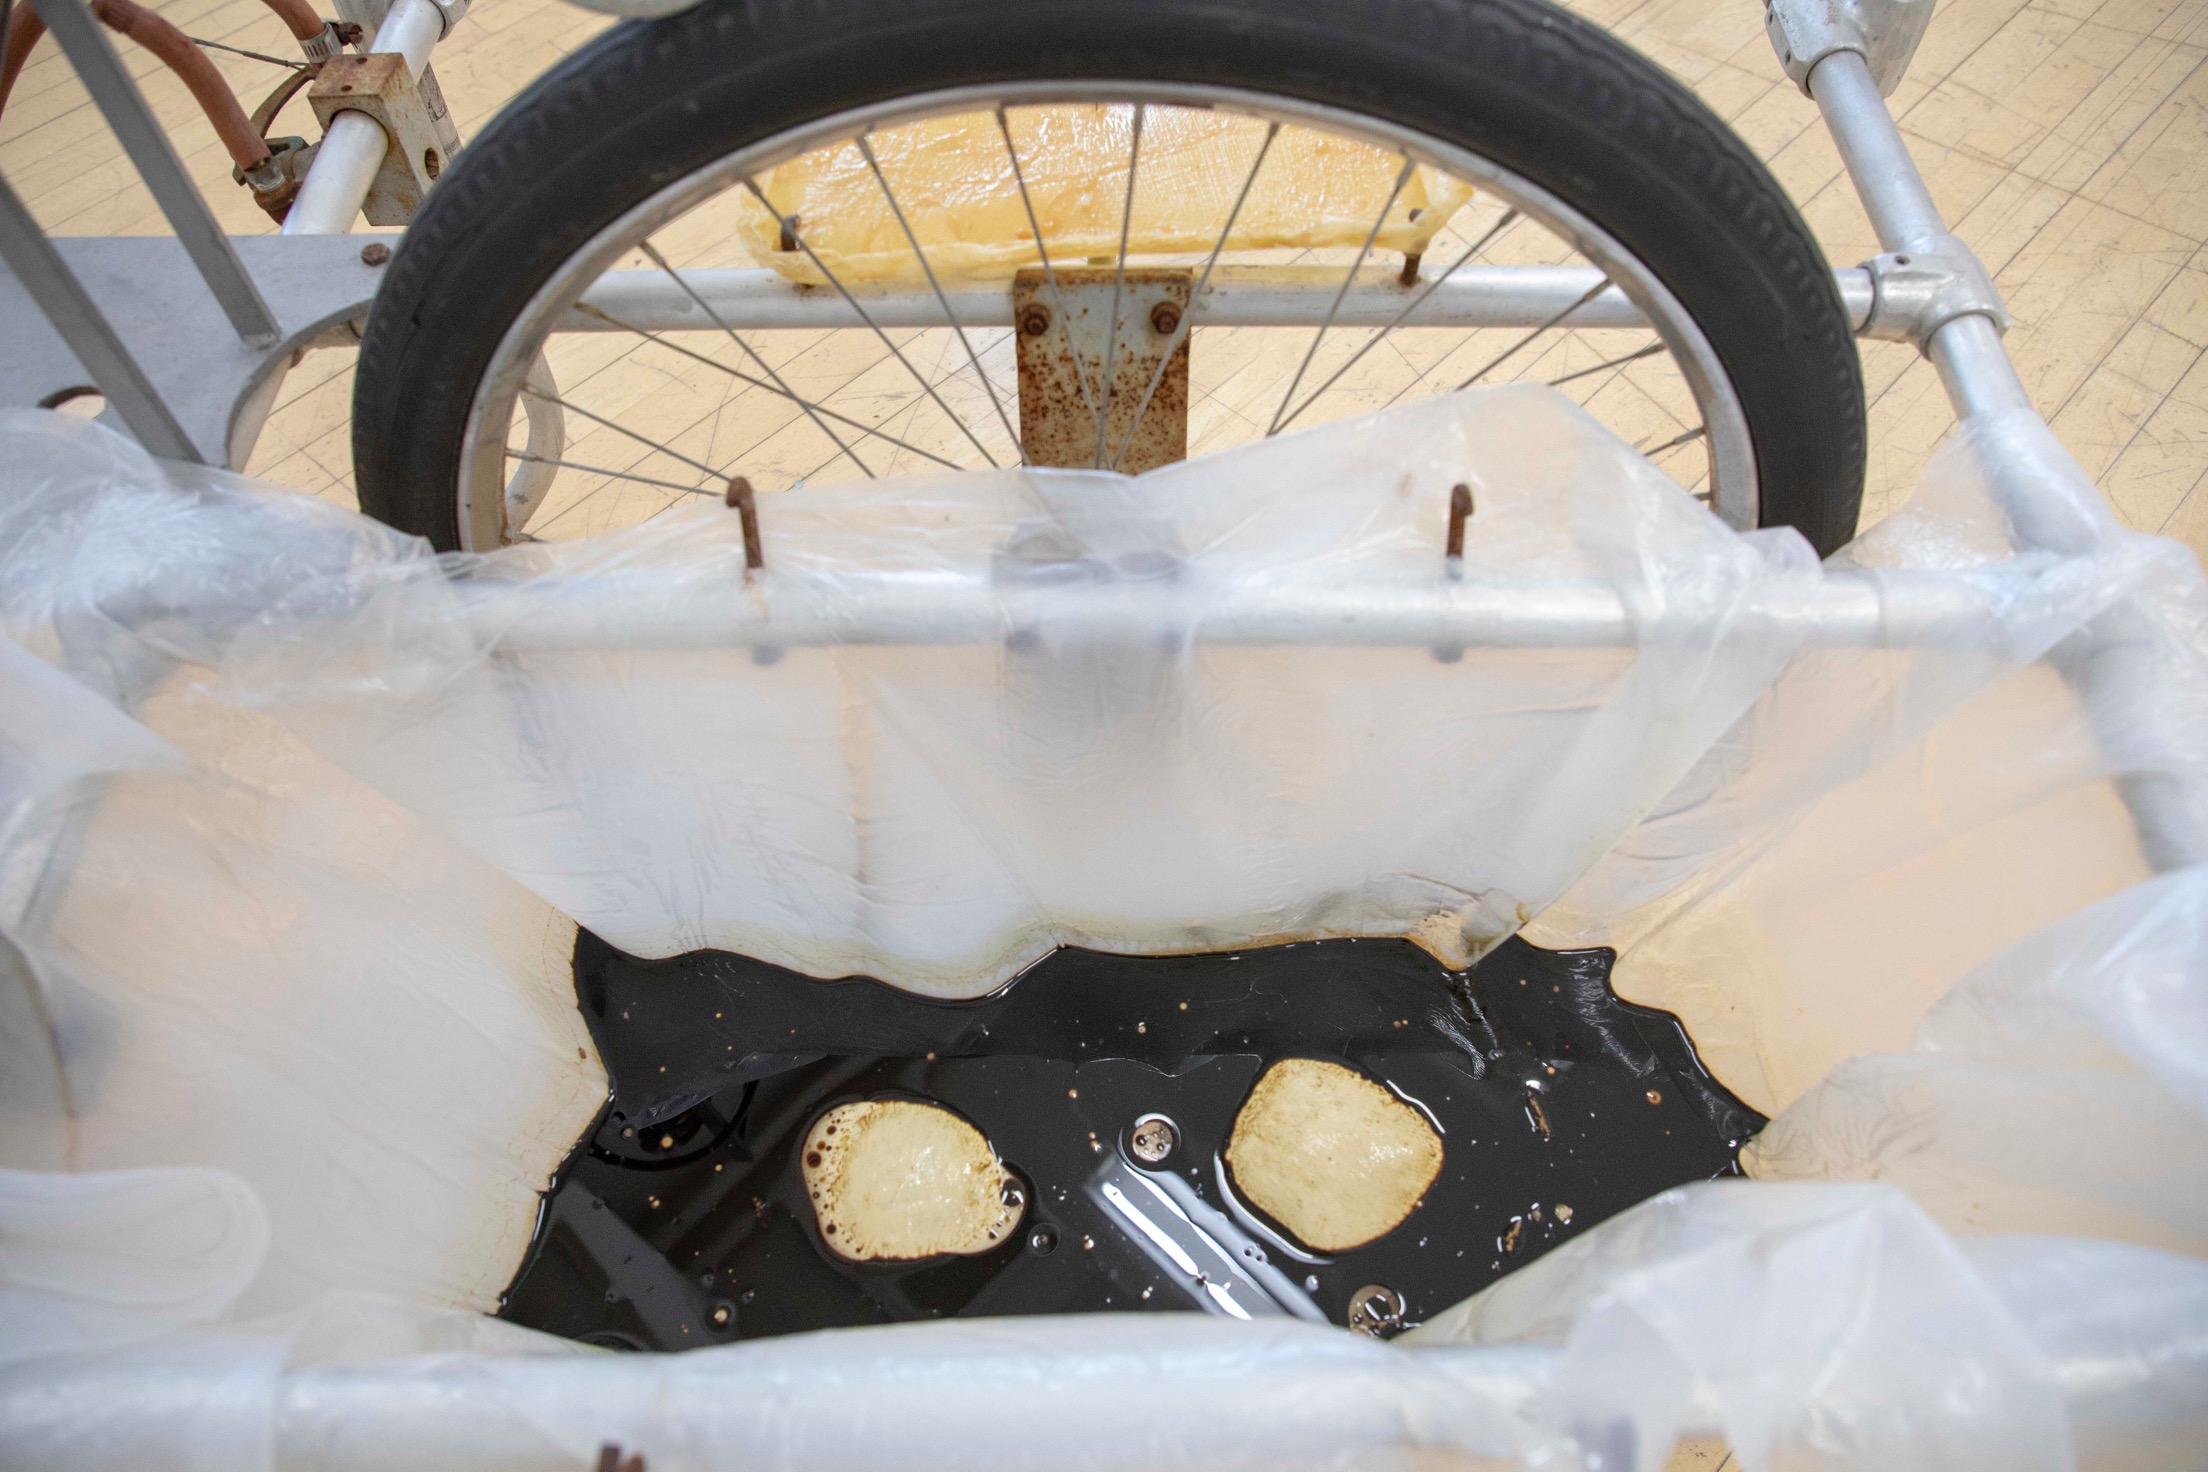 Vladislav Markov  kR , 2018 (detail) silicone bag, water, used motor oil, latex knees casts, aluminum spring, fishing hooks (VM2)